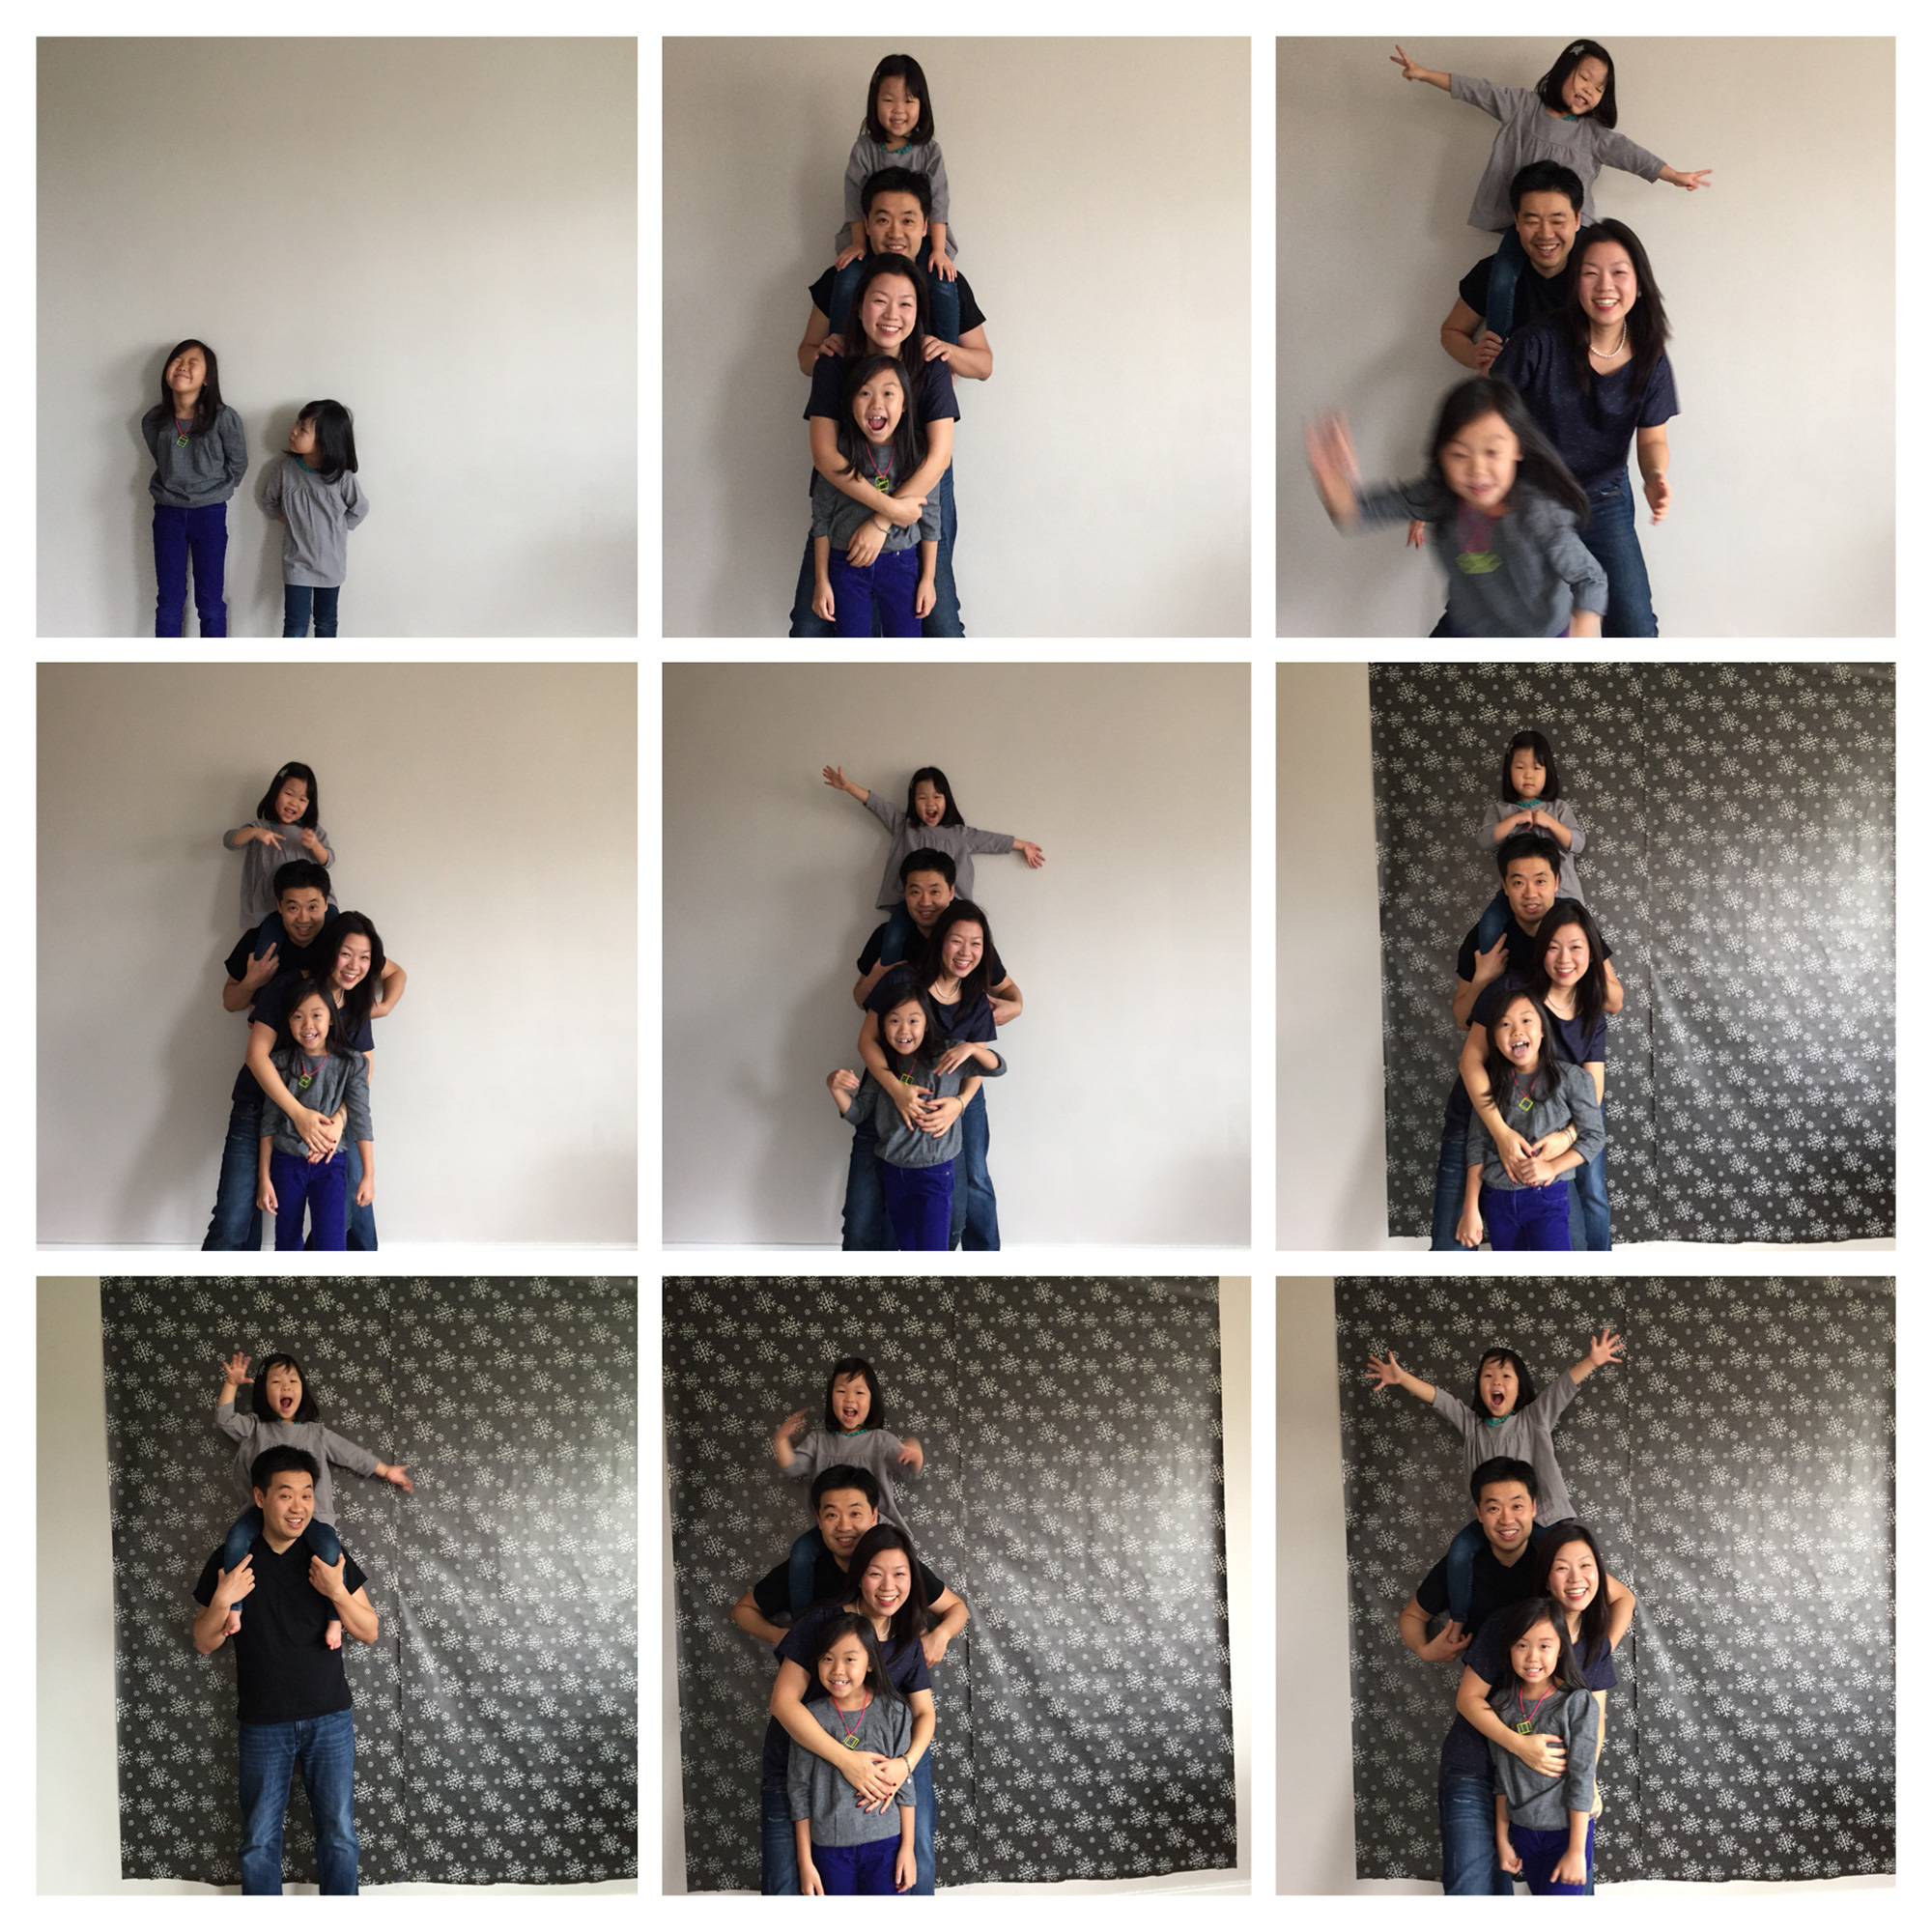 xmasfamilyphoto2014-1